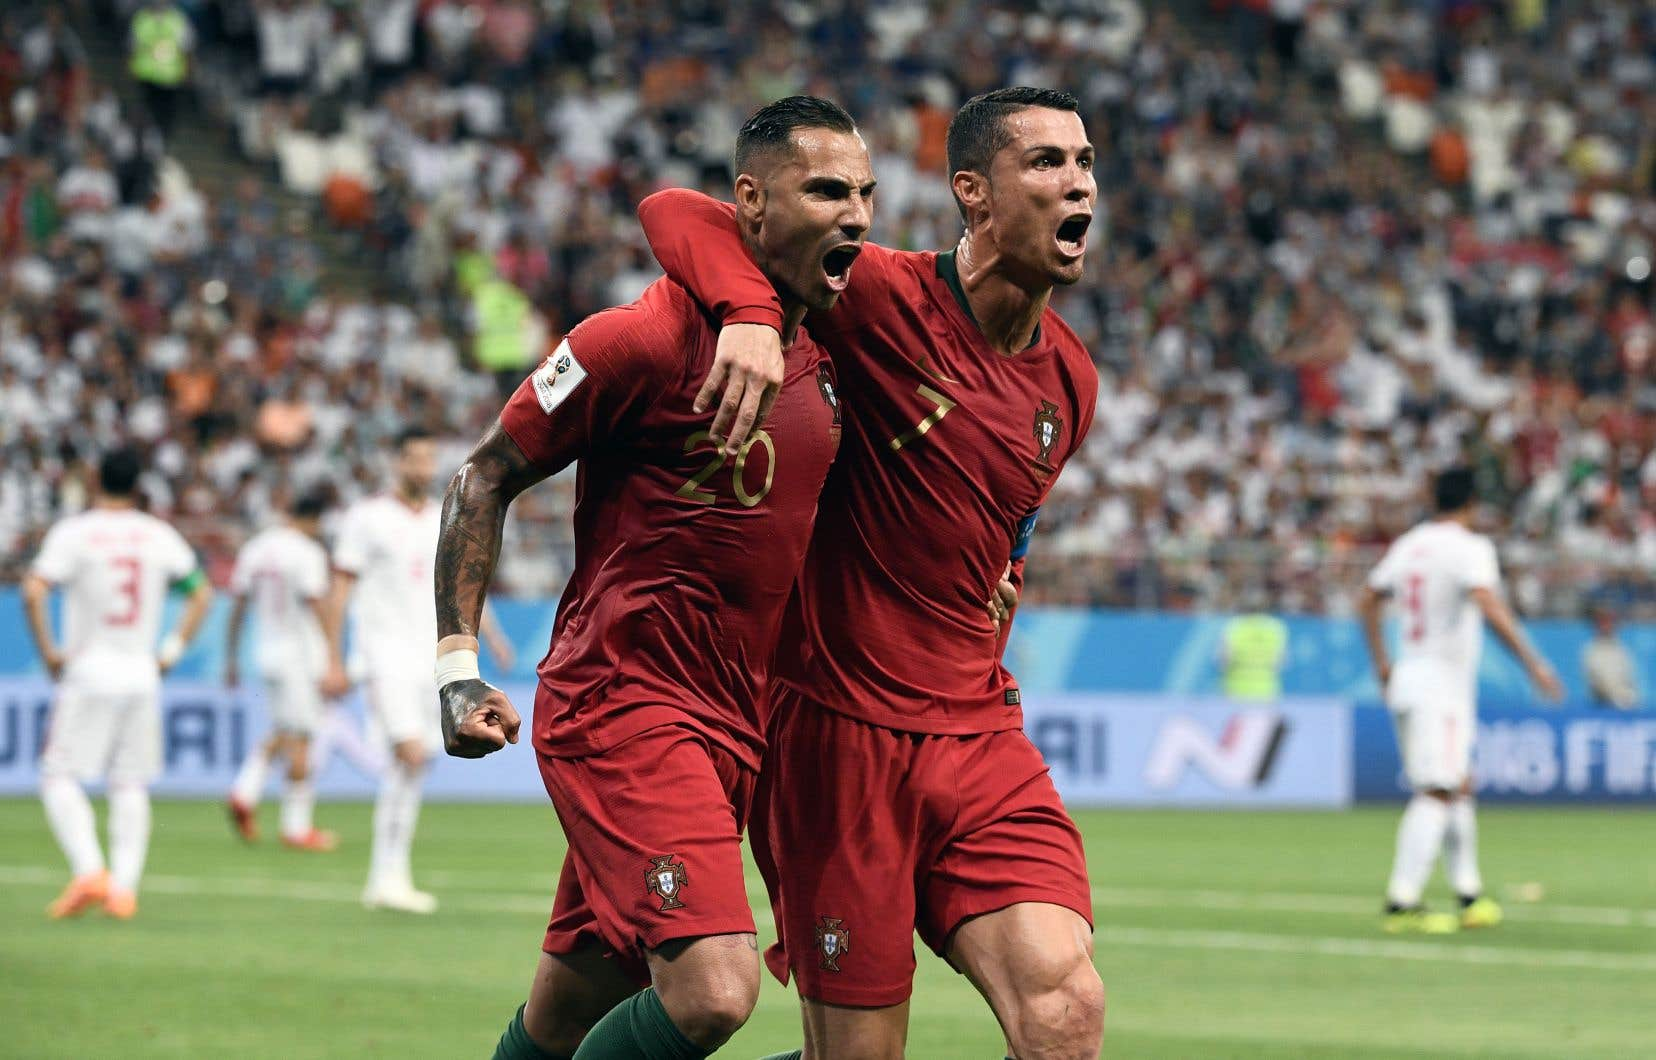 Ricardo Quaresma fête son but contre l'Iran en compagnie de son coéquipier Cristiano Ronaldo.<br /> <br />